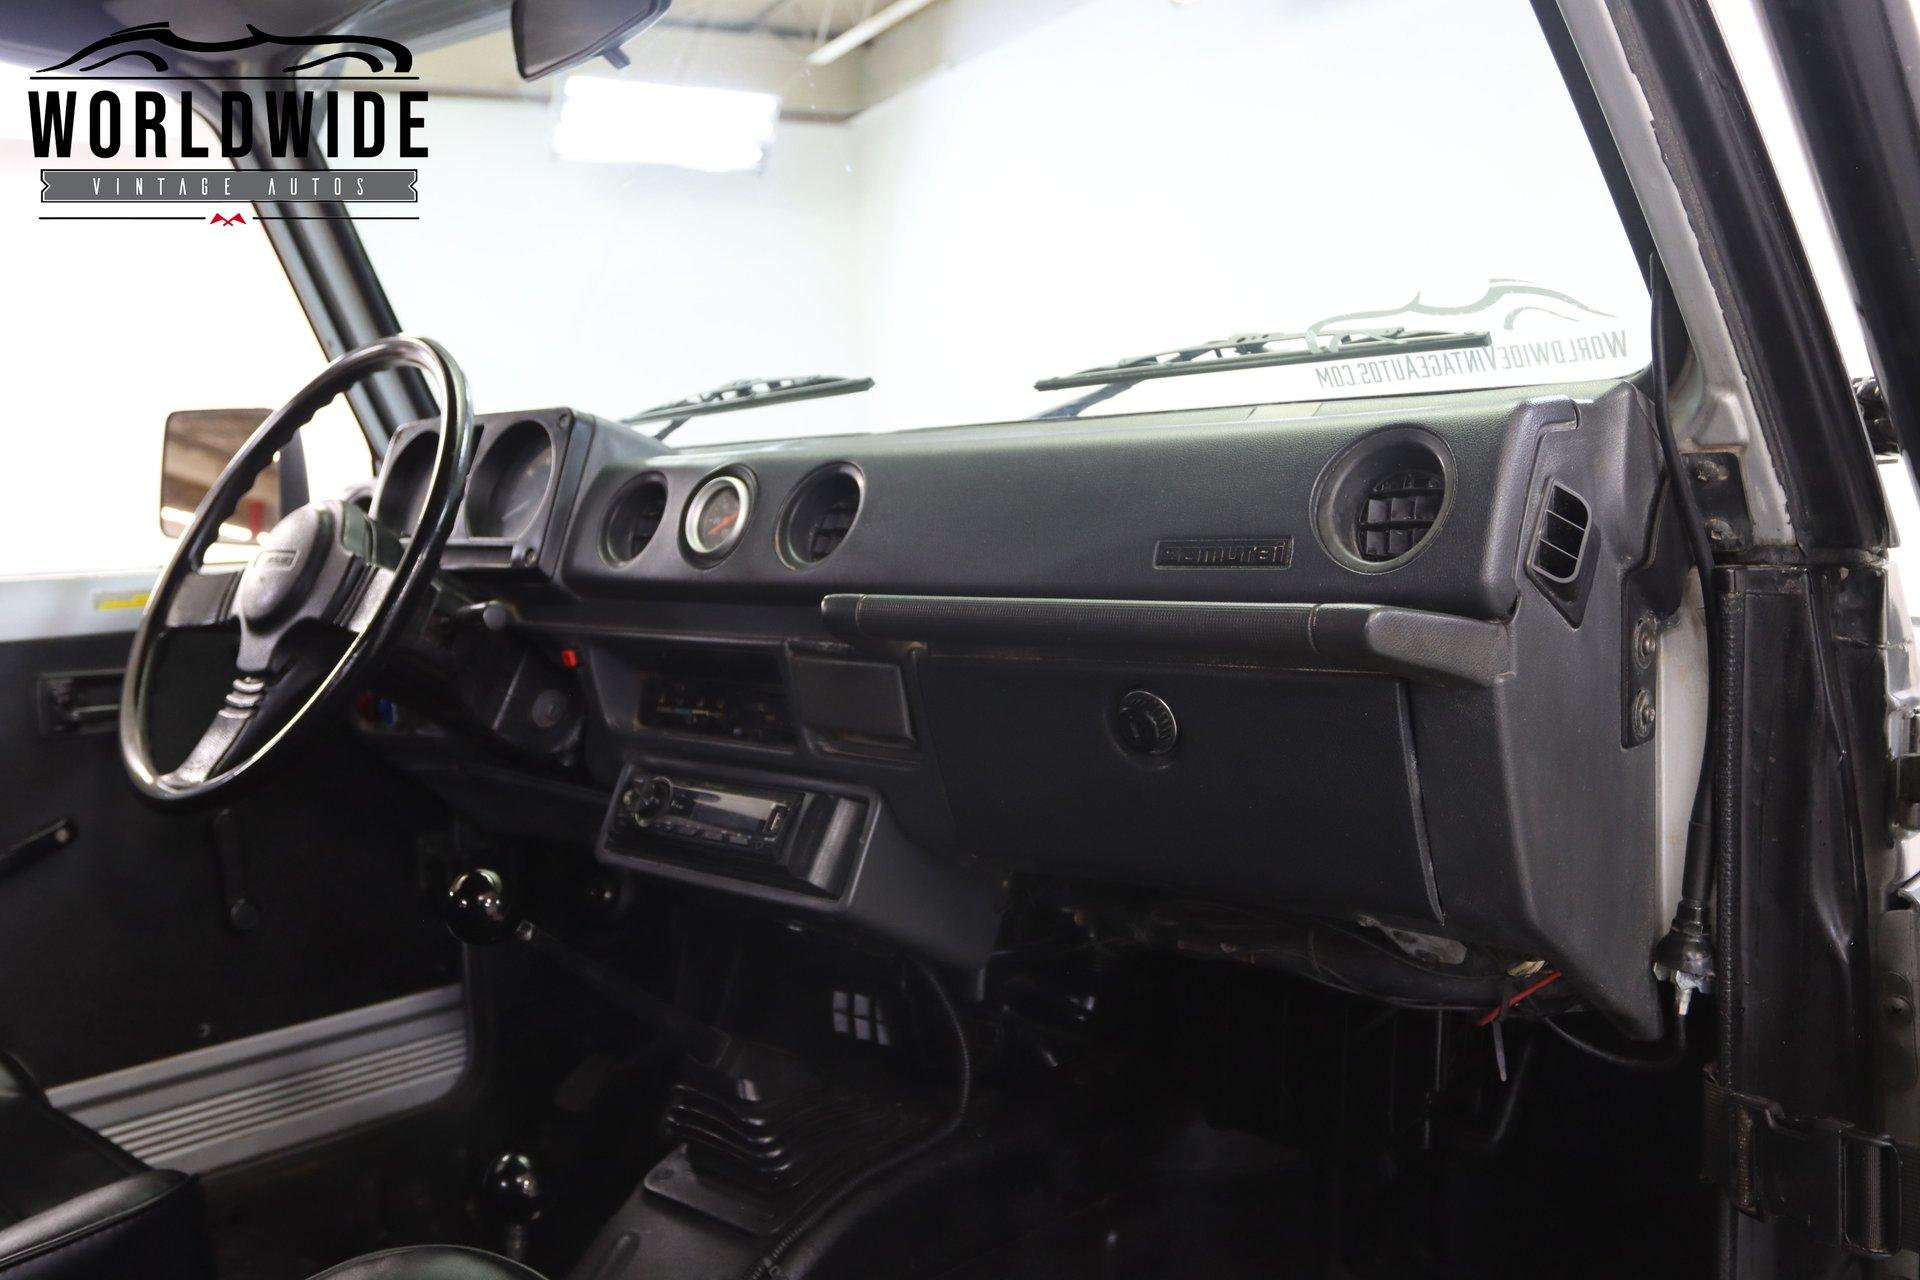 1988 Suzuki Samurai